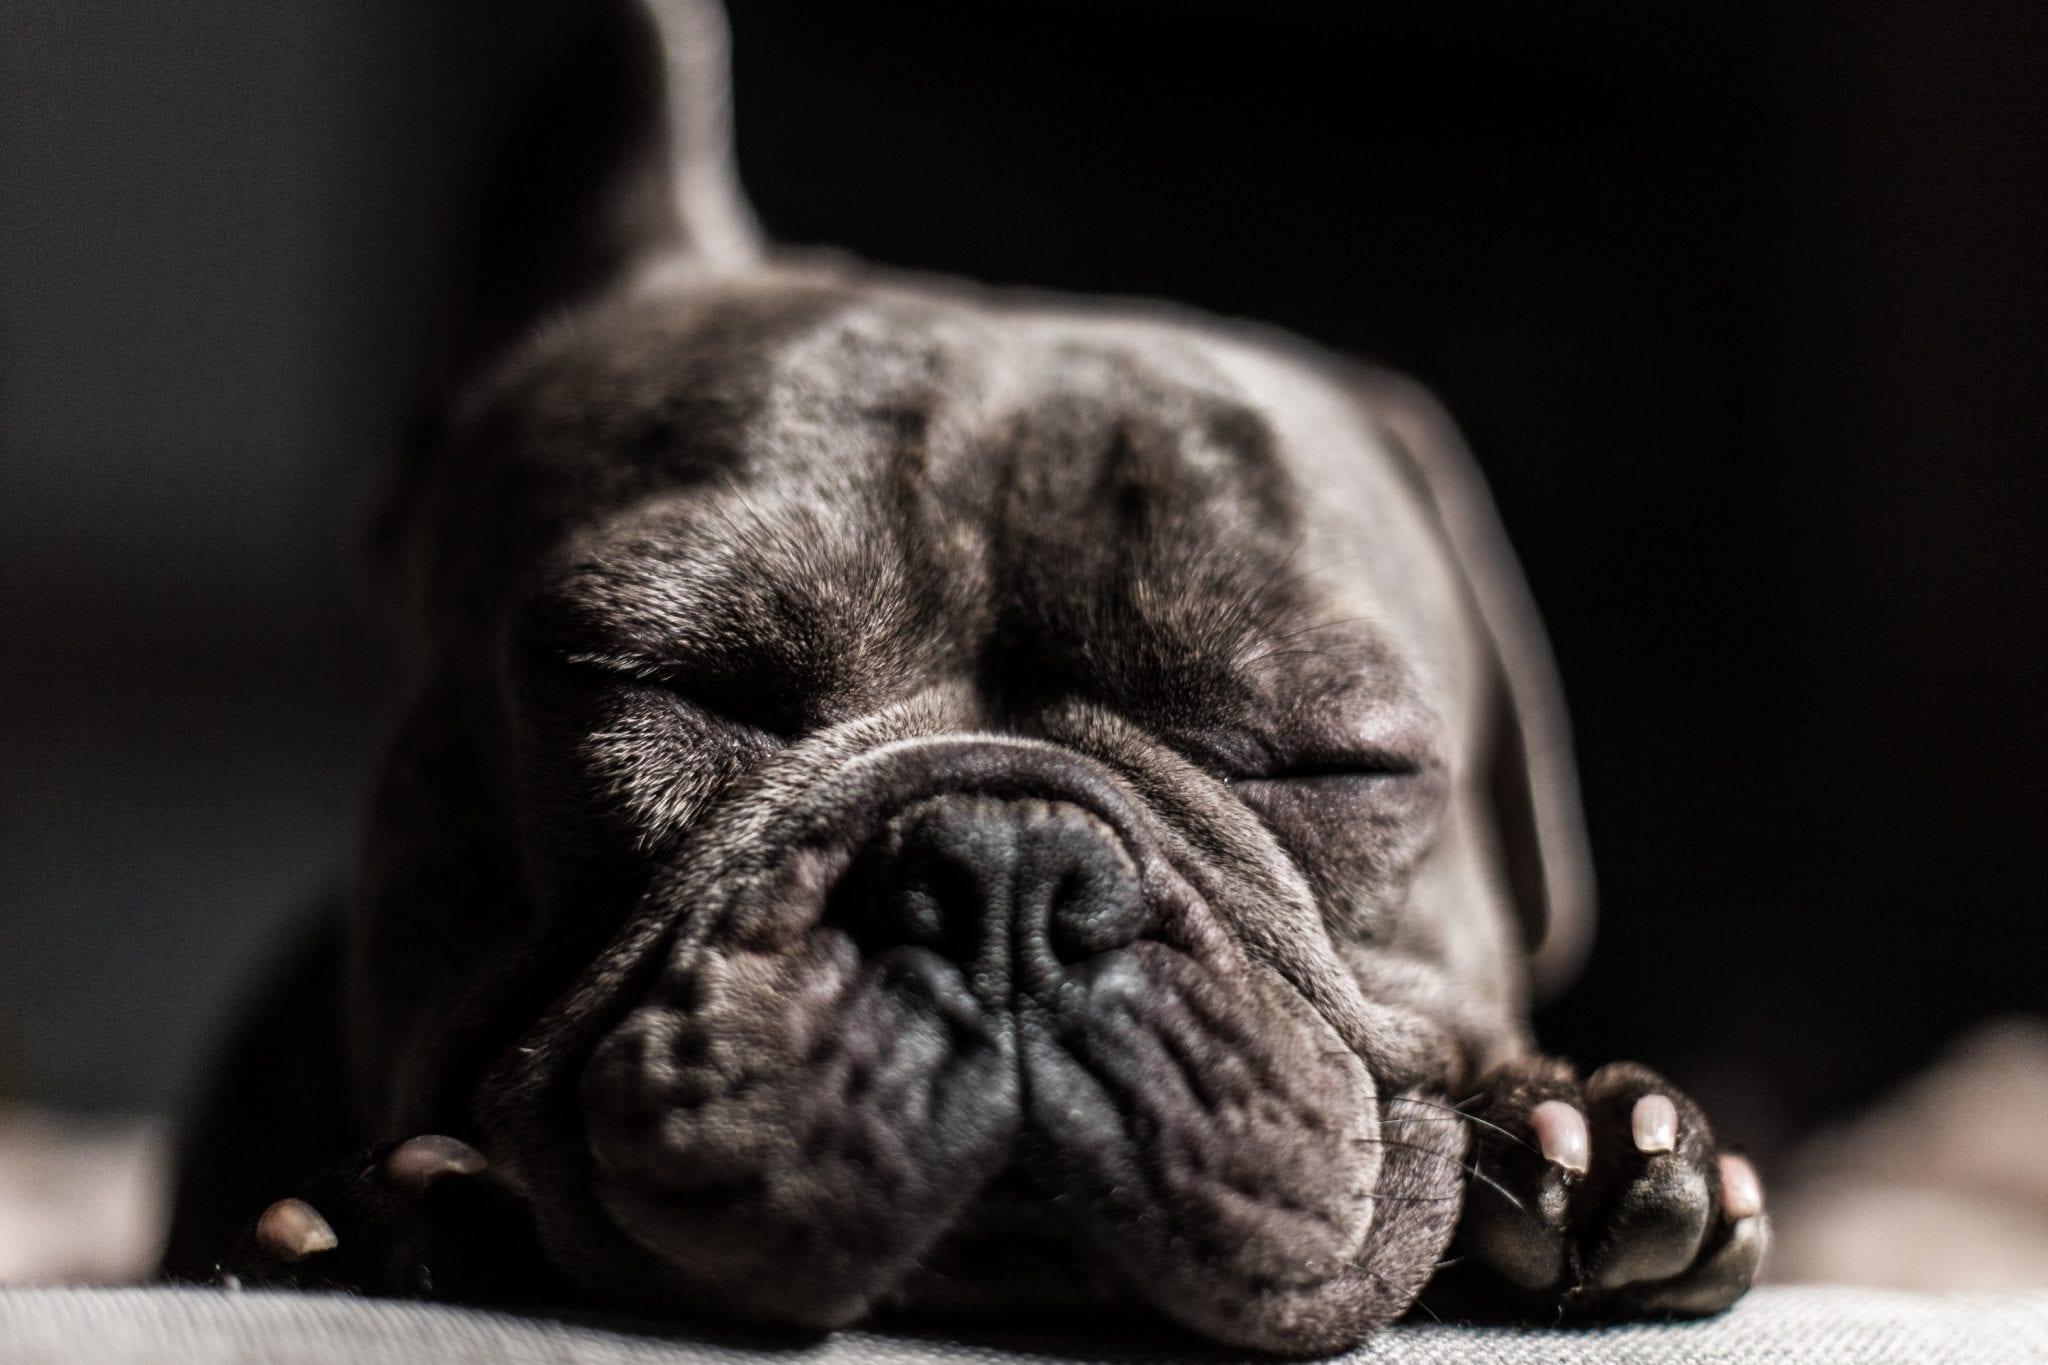 puppy sleeping, eyes closed